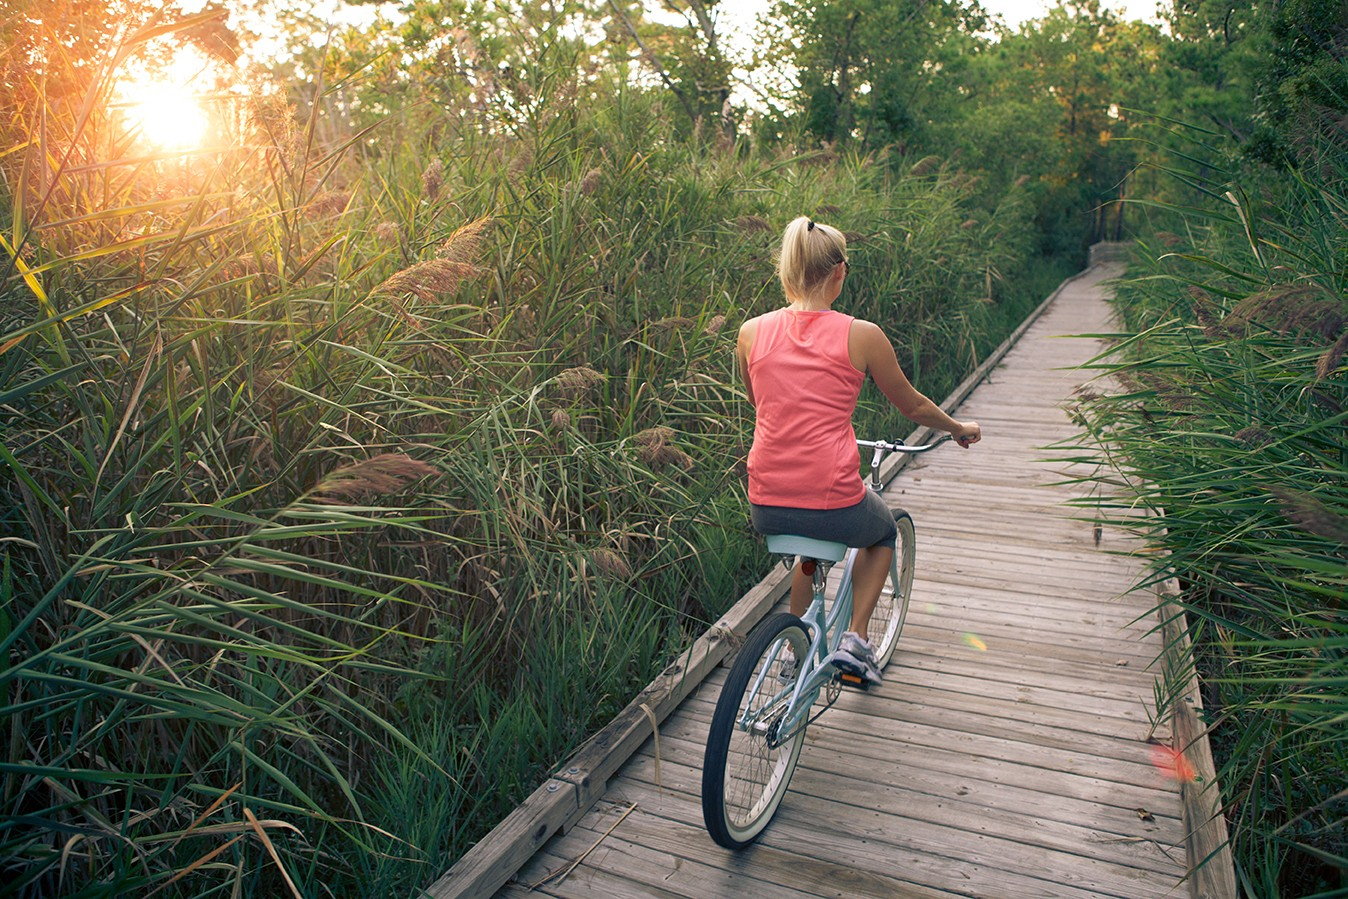 Miles of biking paths to explore.